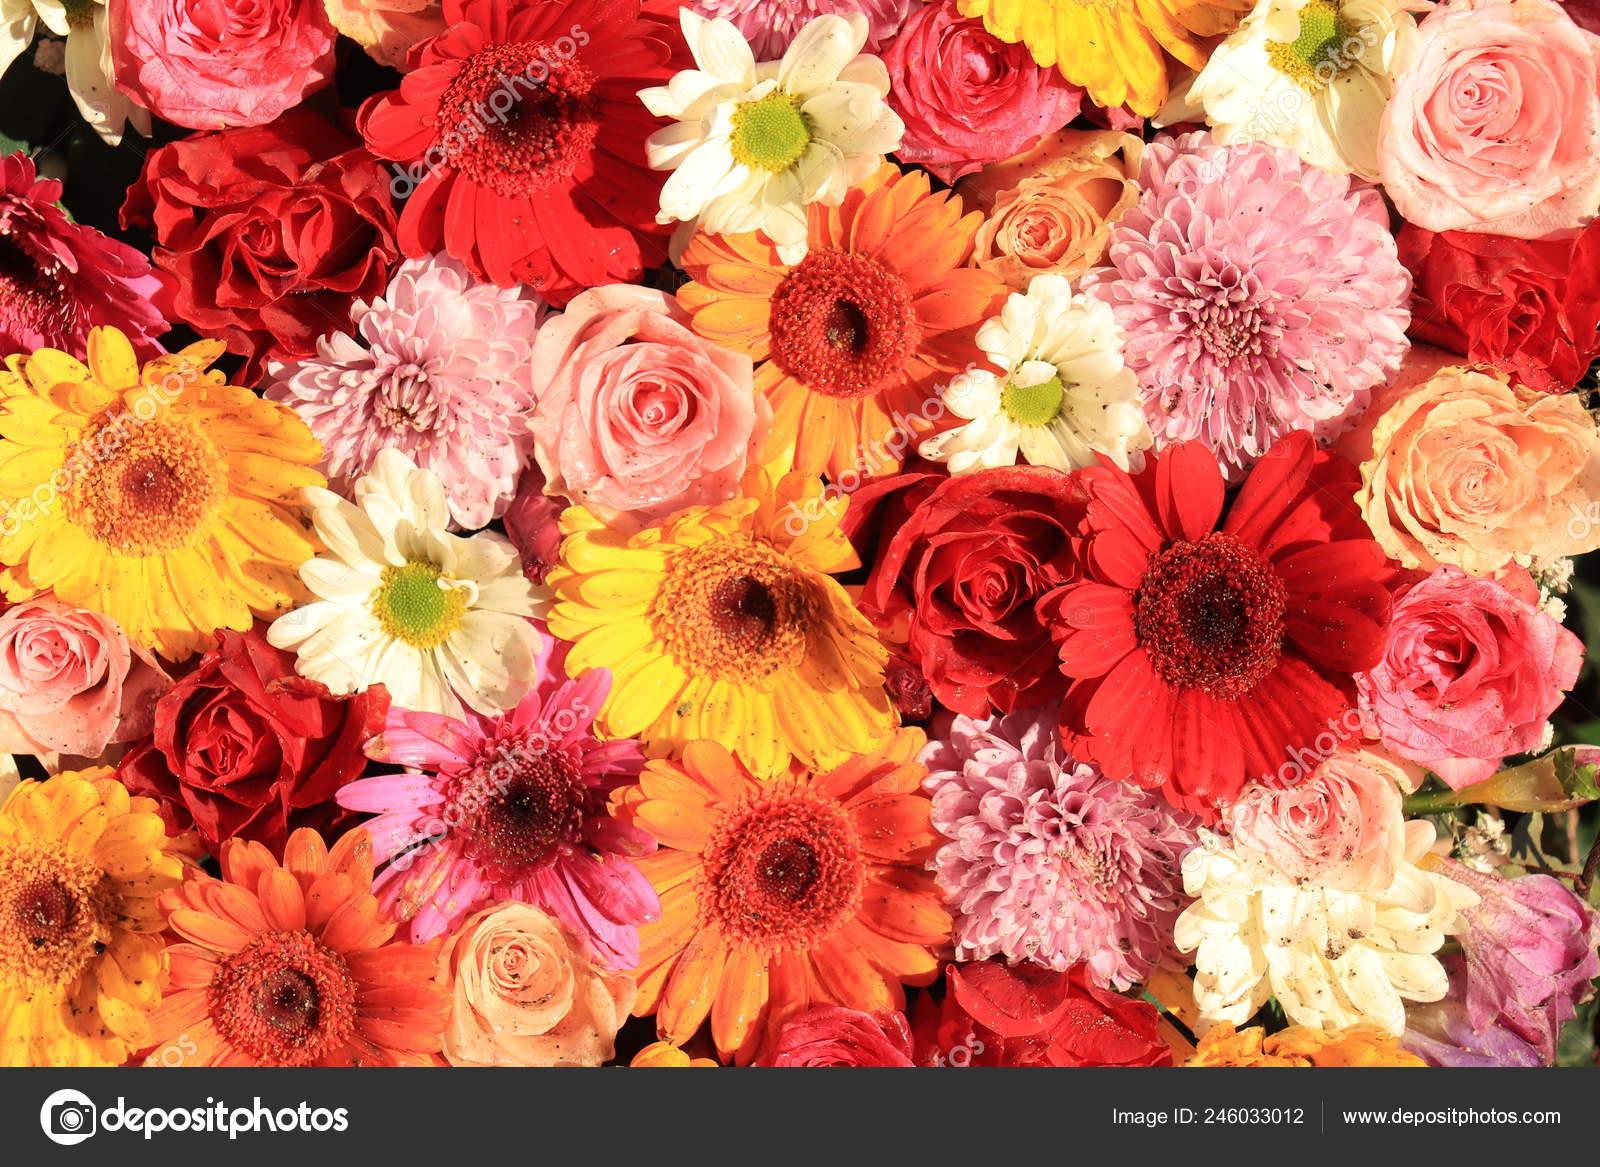 Mixed Flower Arrangement Wedding Roses Gerberas Pink Yellow Red Stock Photo C Portosabbia 246033012